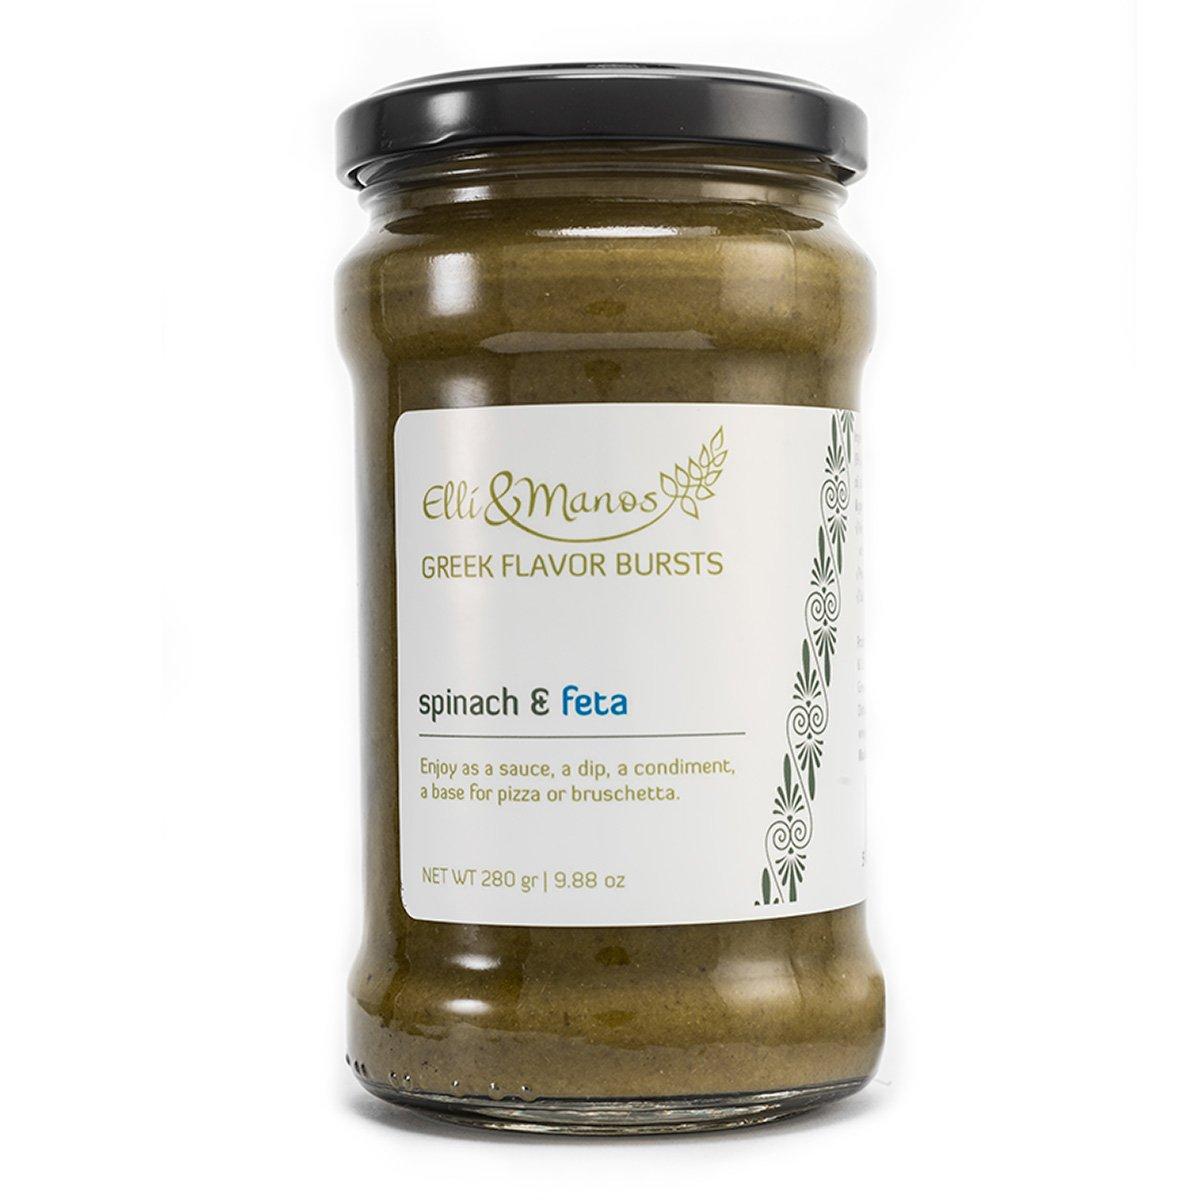 Elli & Manos Greek Flavor Bursts - Spinach & Feta - 280gr/9.88oz - highly concentrated spread/veggie dip